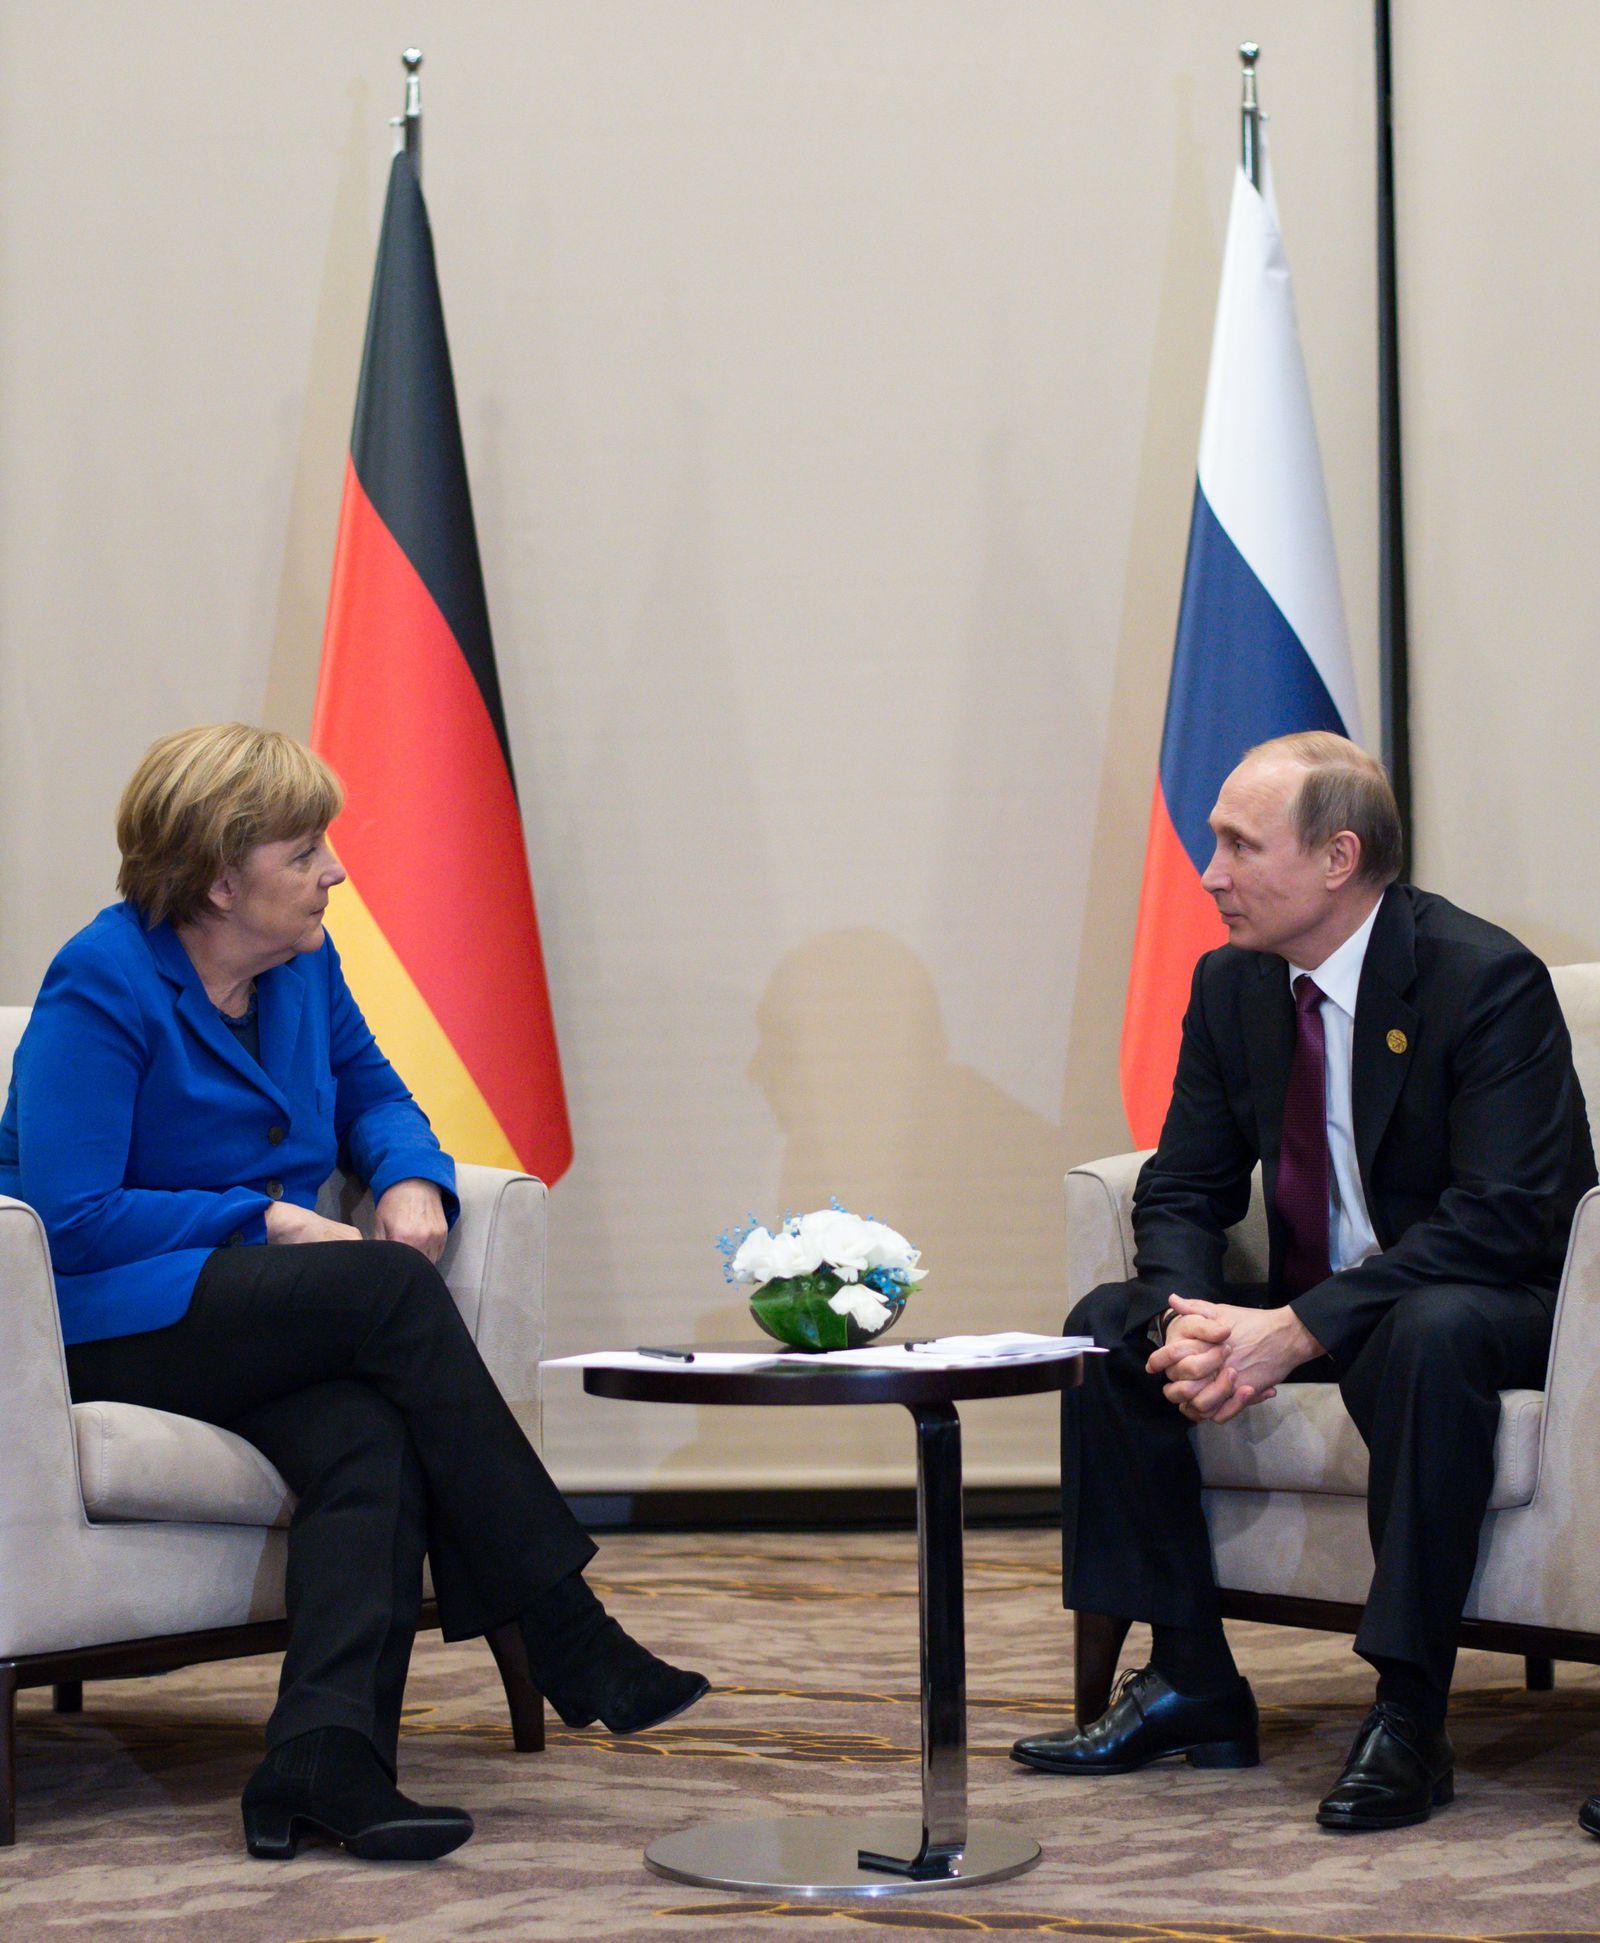 G20-Gipfel Merkel Putin